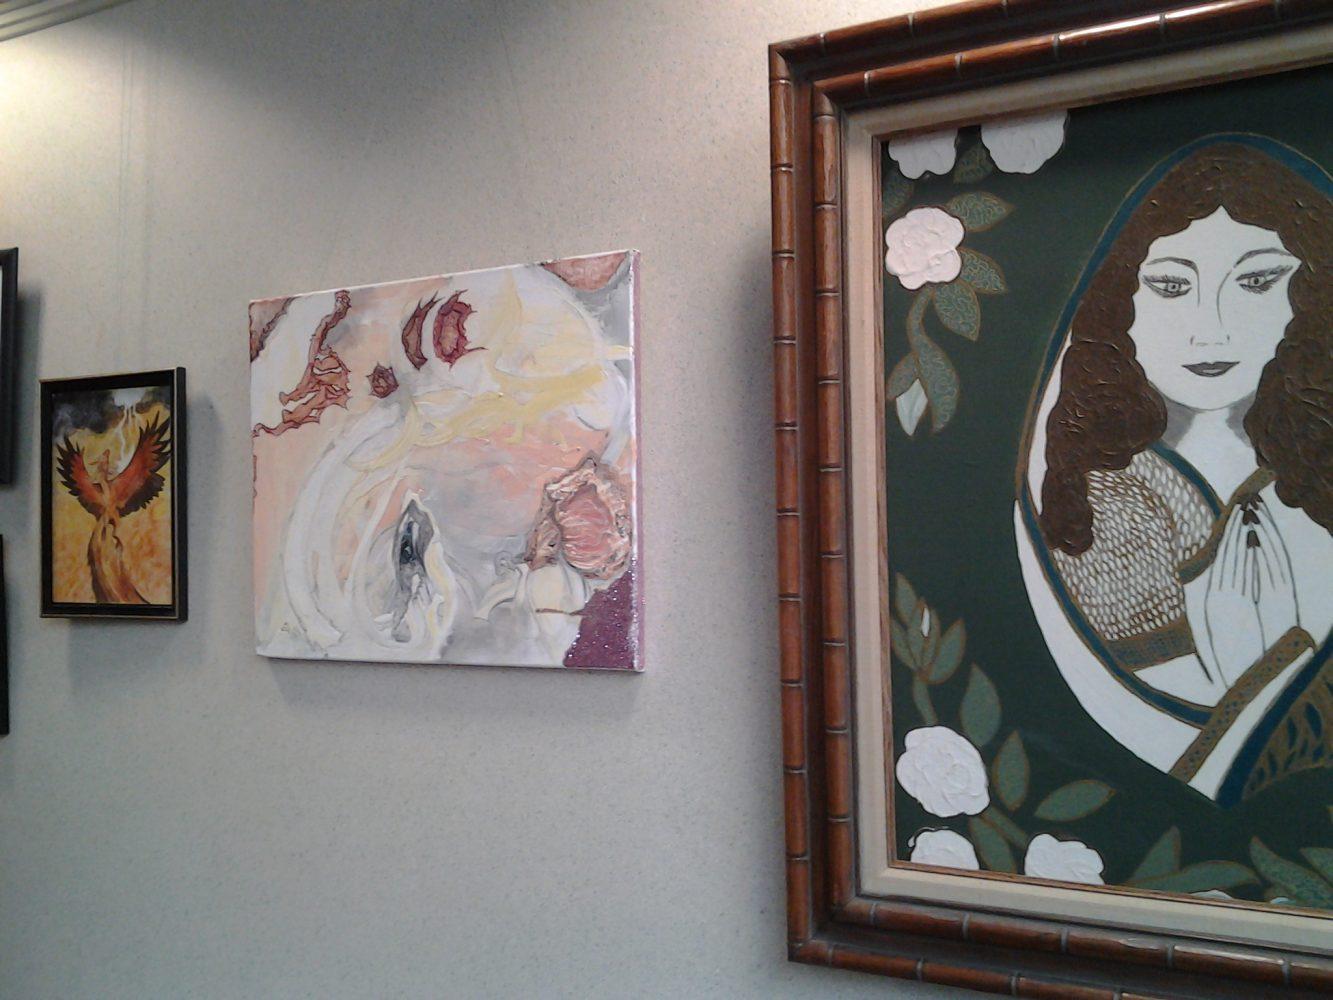 Artwork on display as part of the Survivor's Art Exhibit.